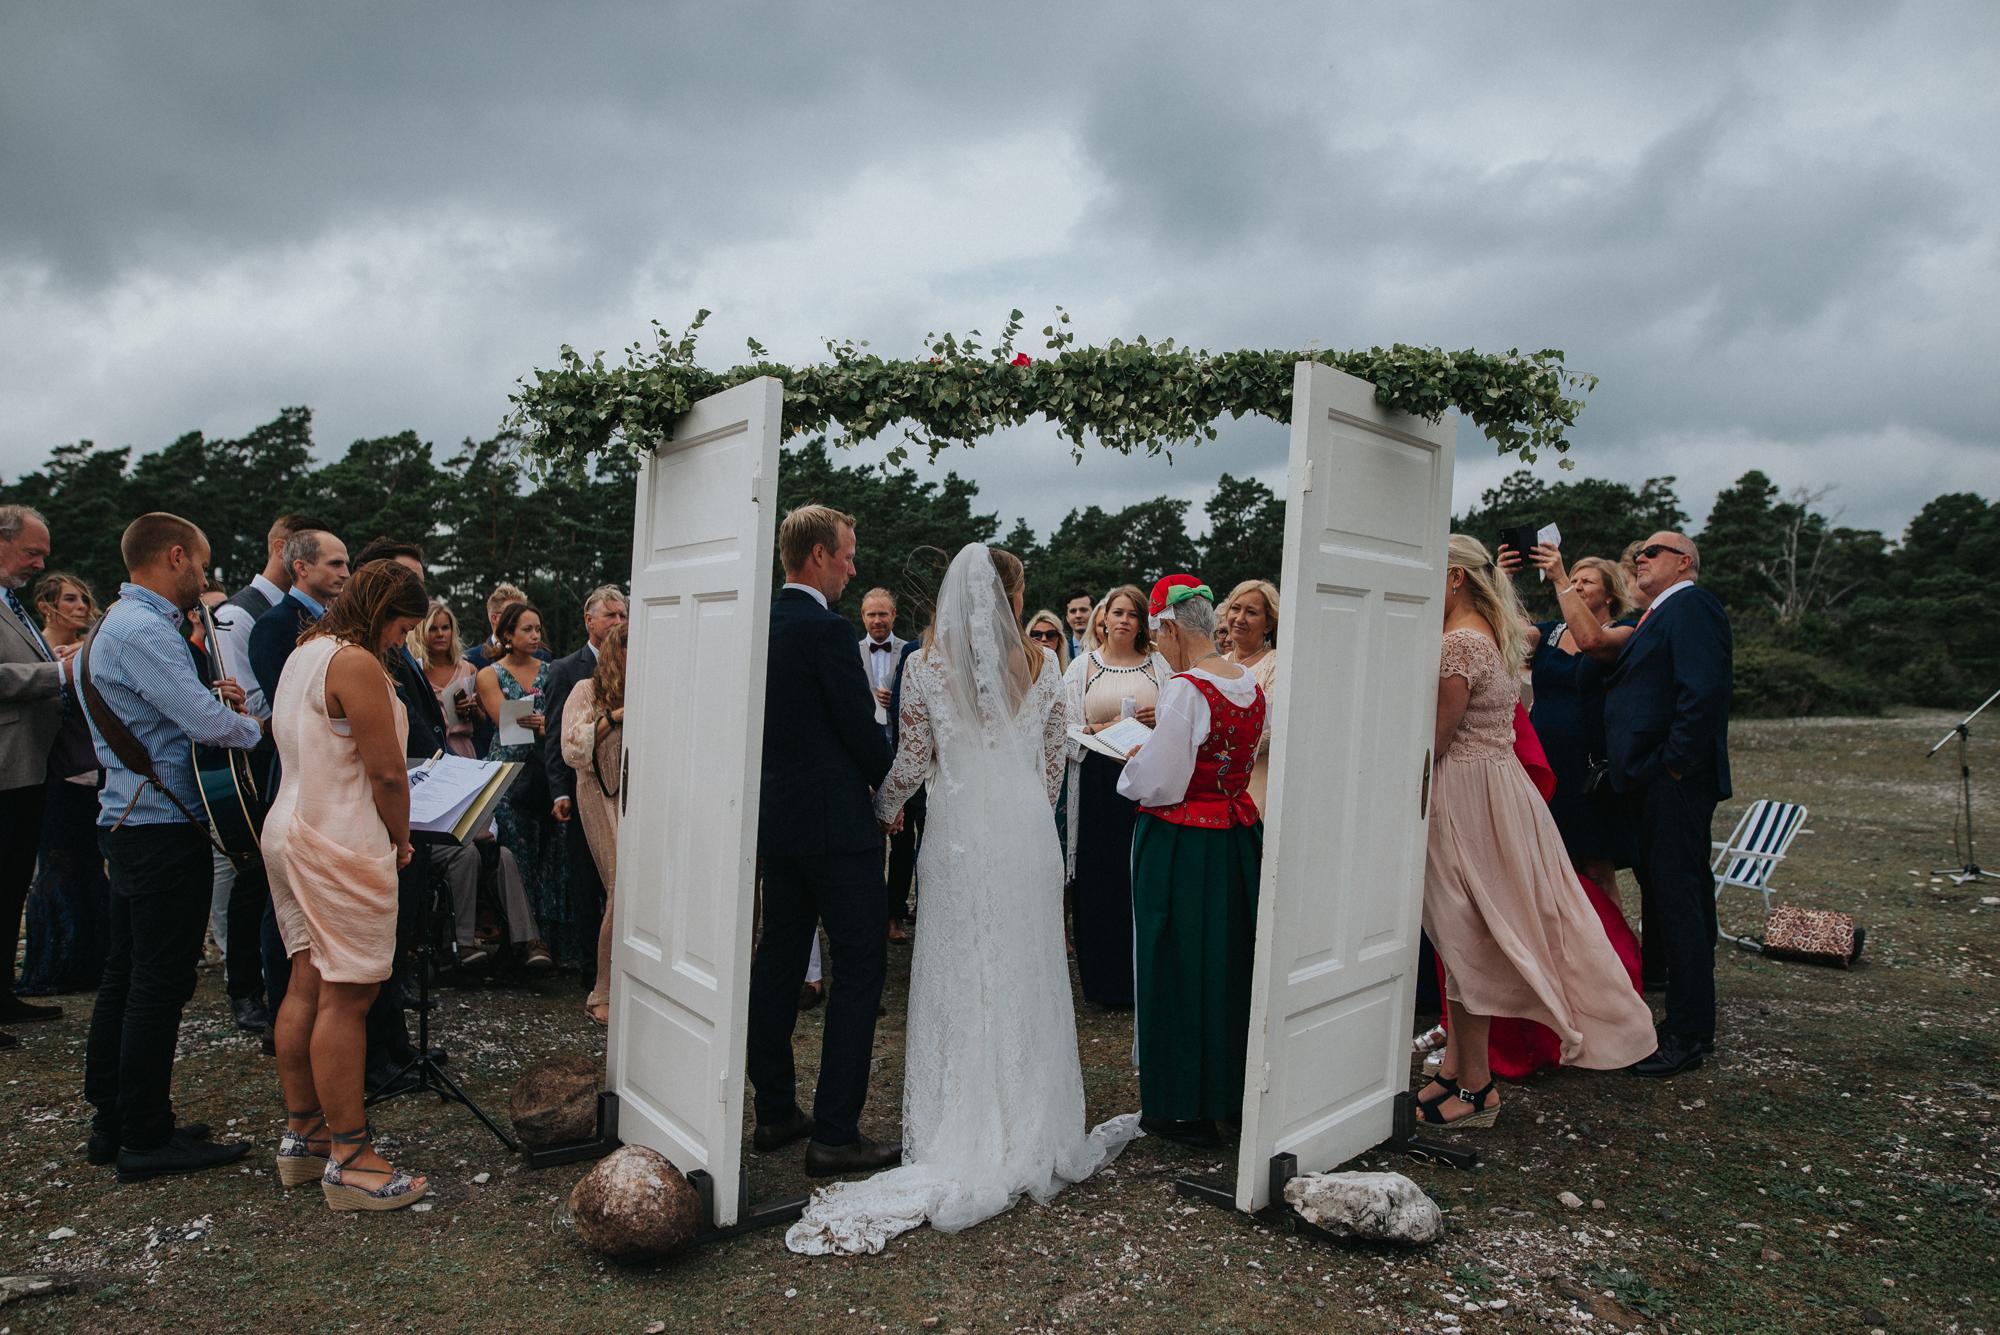 035-bröllopsfotograf-folhammar-gotland-neas-fotografi.jpg